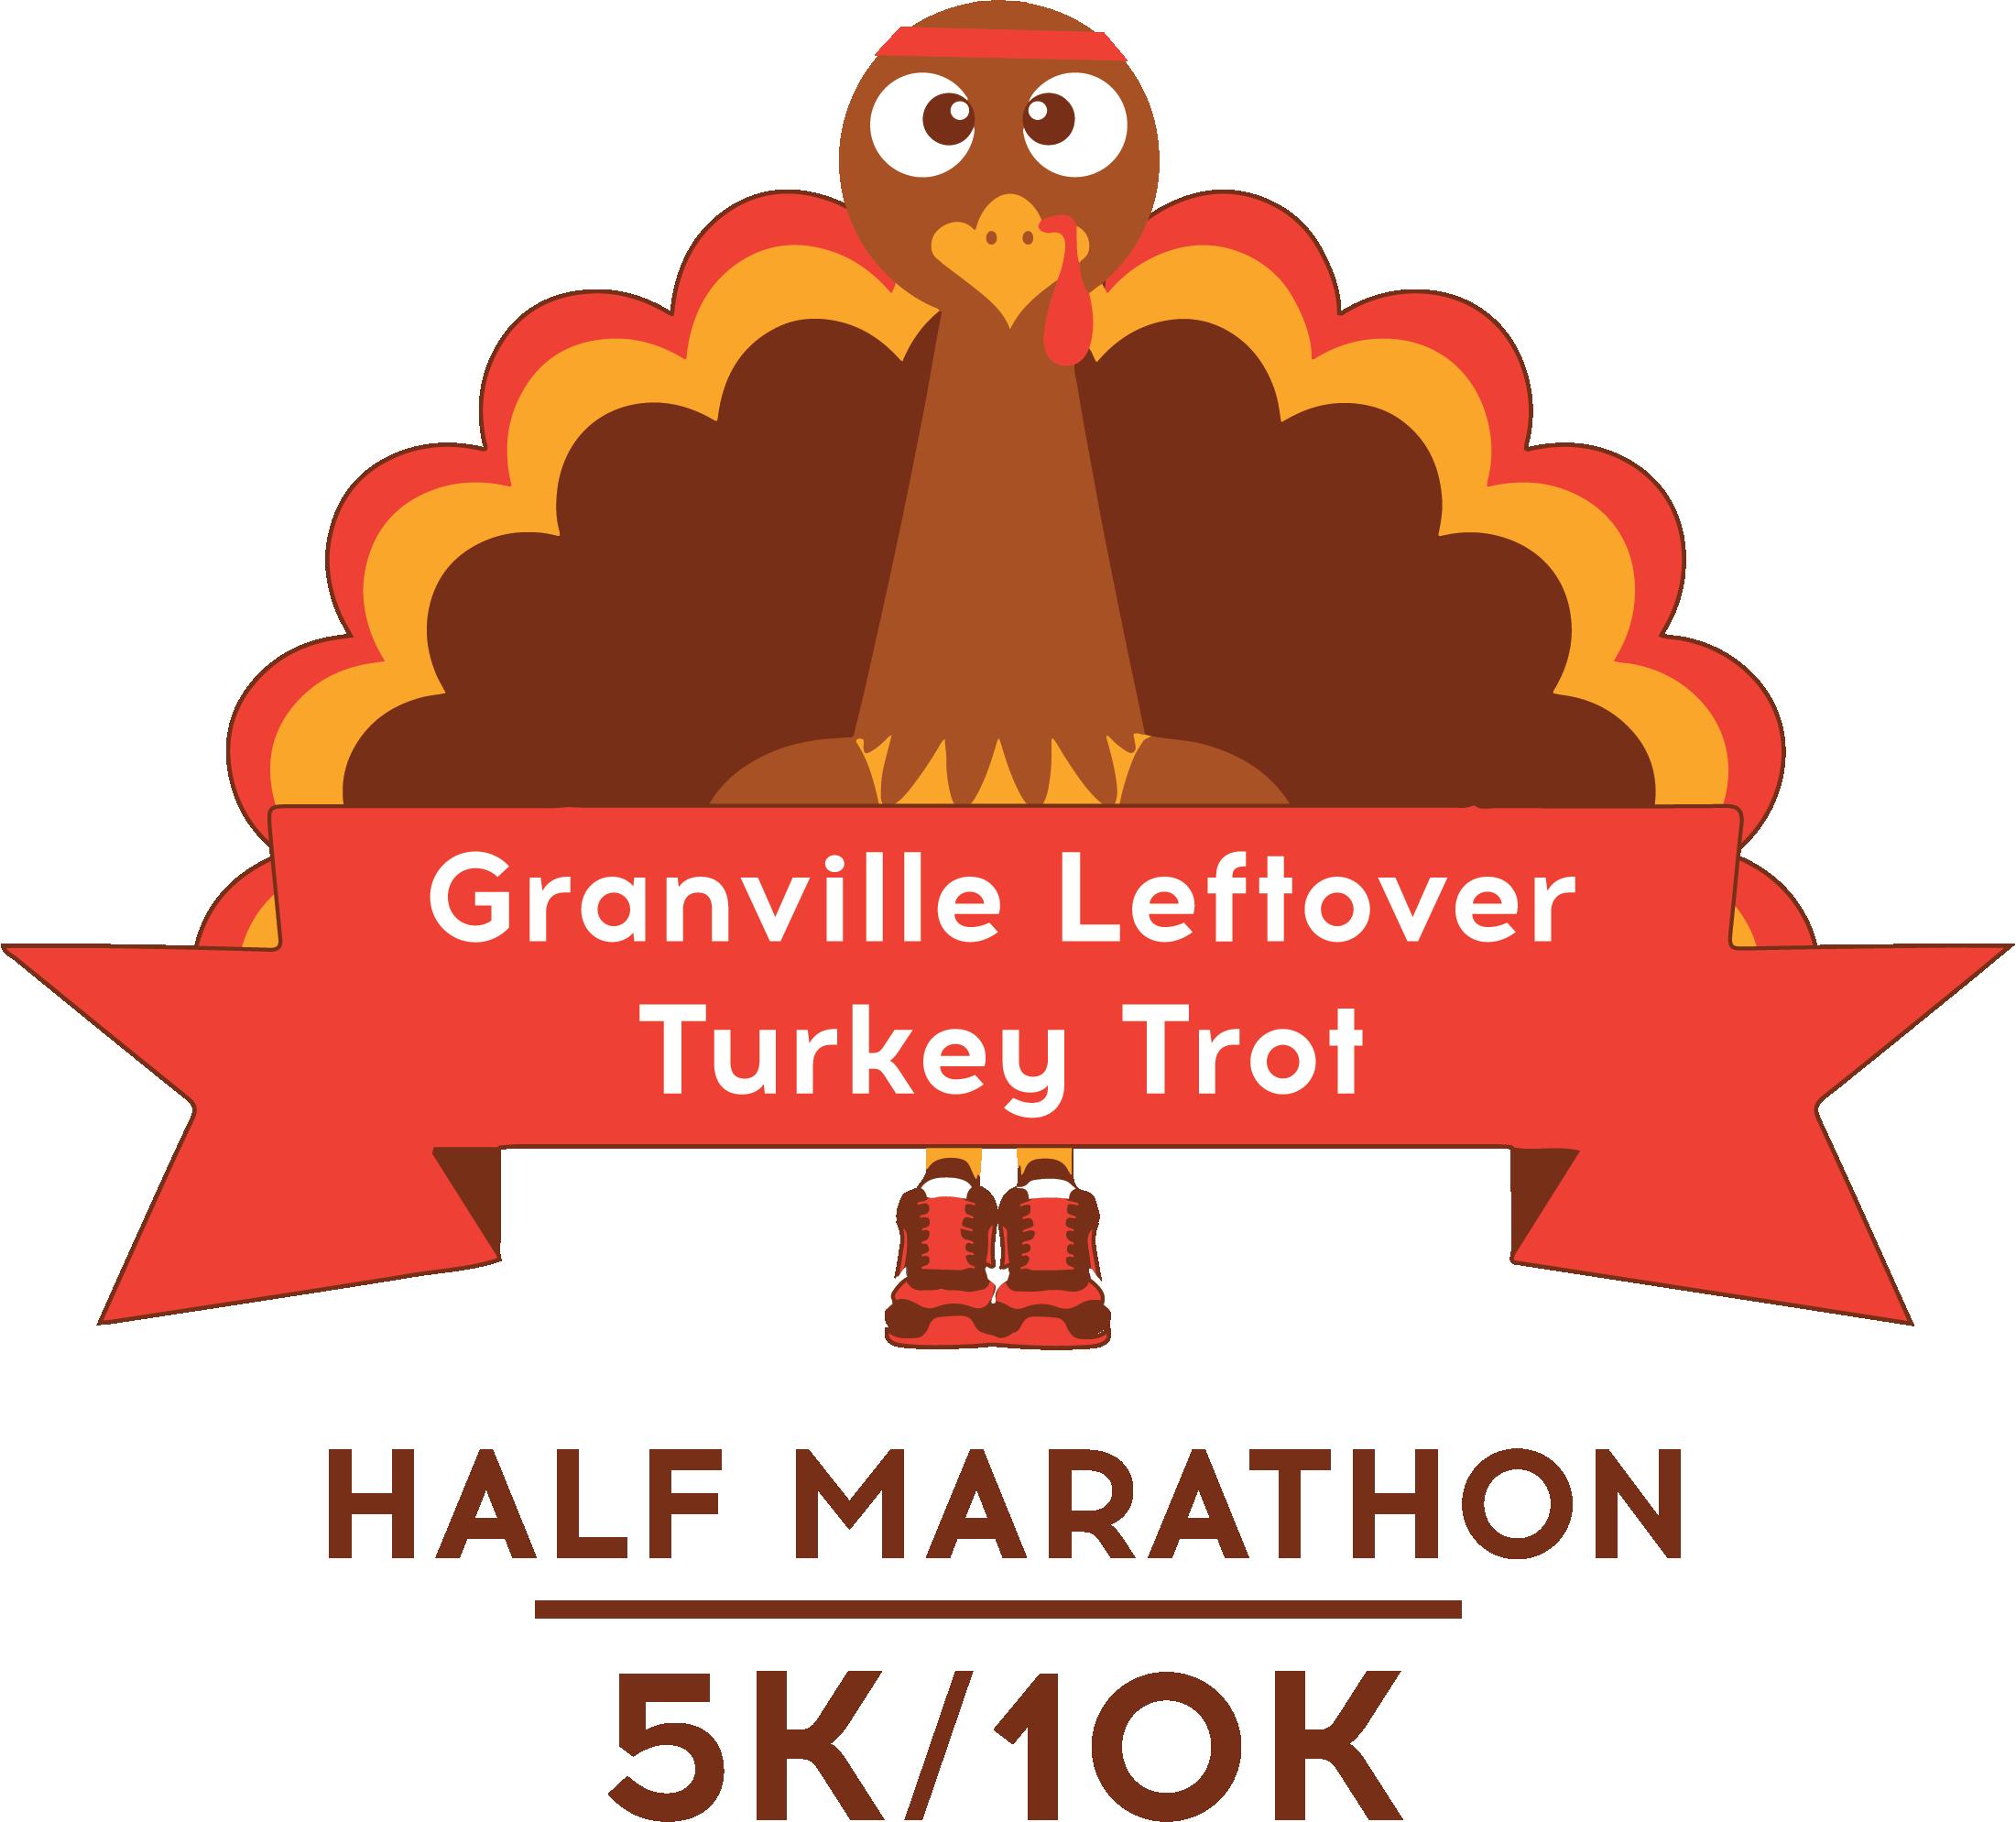 Granville Leftover Turkey Trot Logo Half Marathon, 10k and 5k Race Event in Ohio